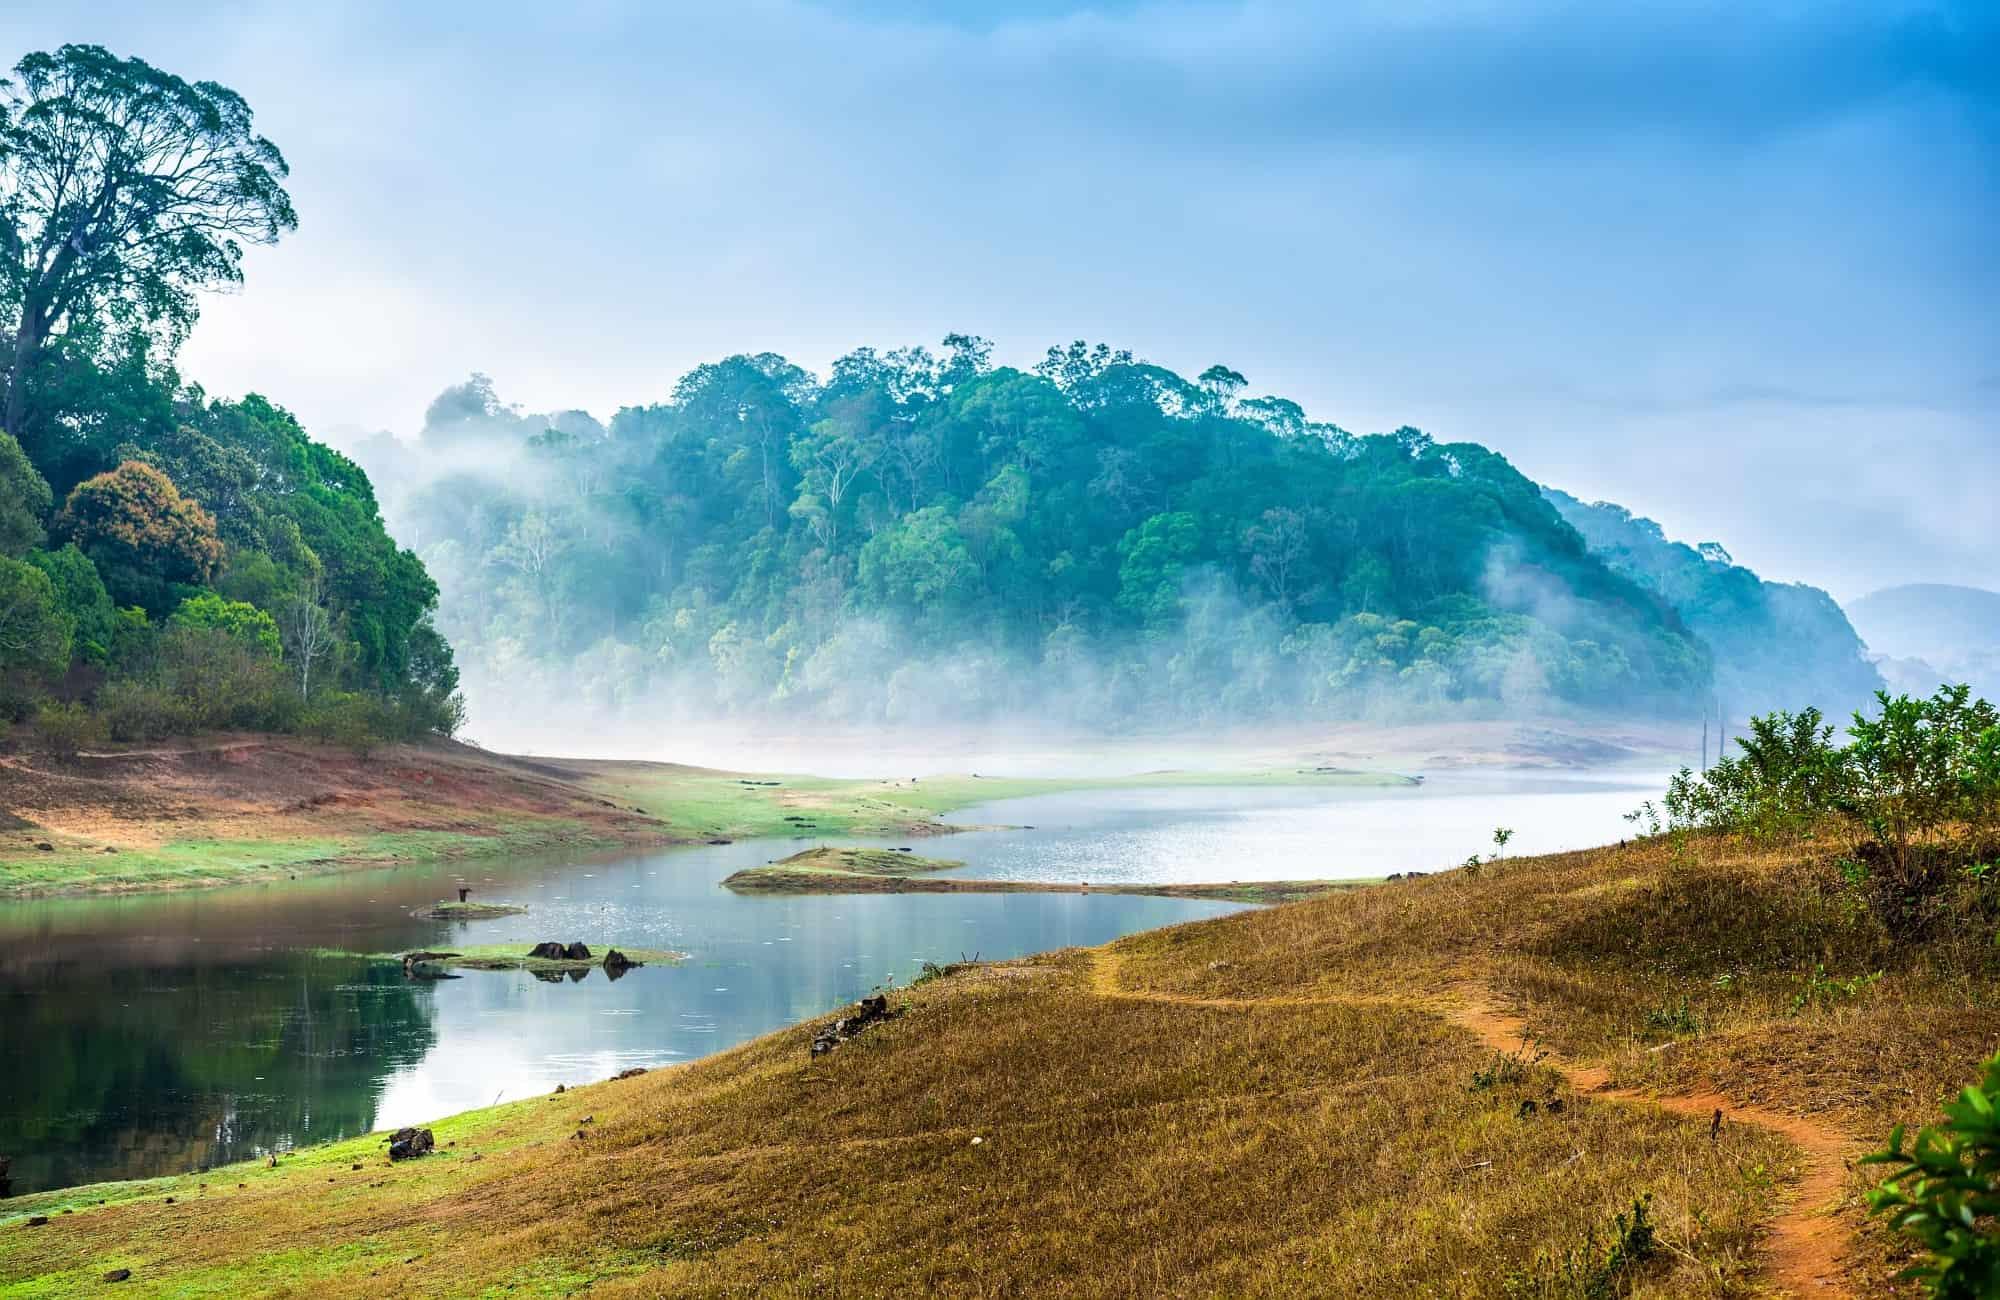 Voyage au Kerala - Parc National de Periyar - Amplitudes